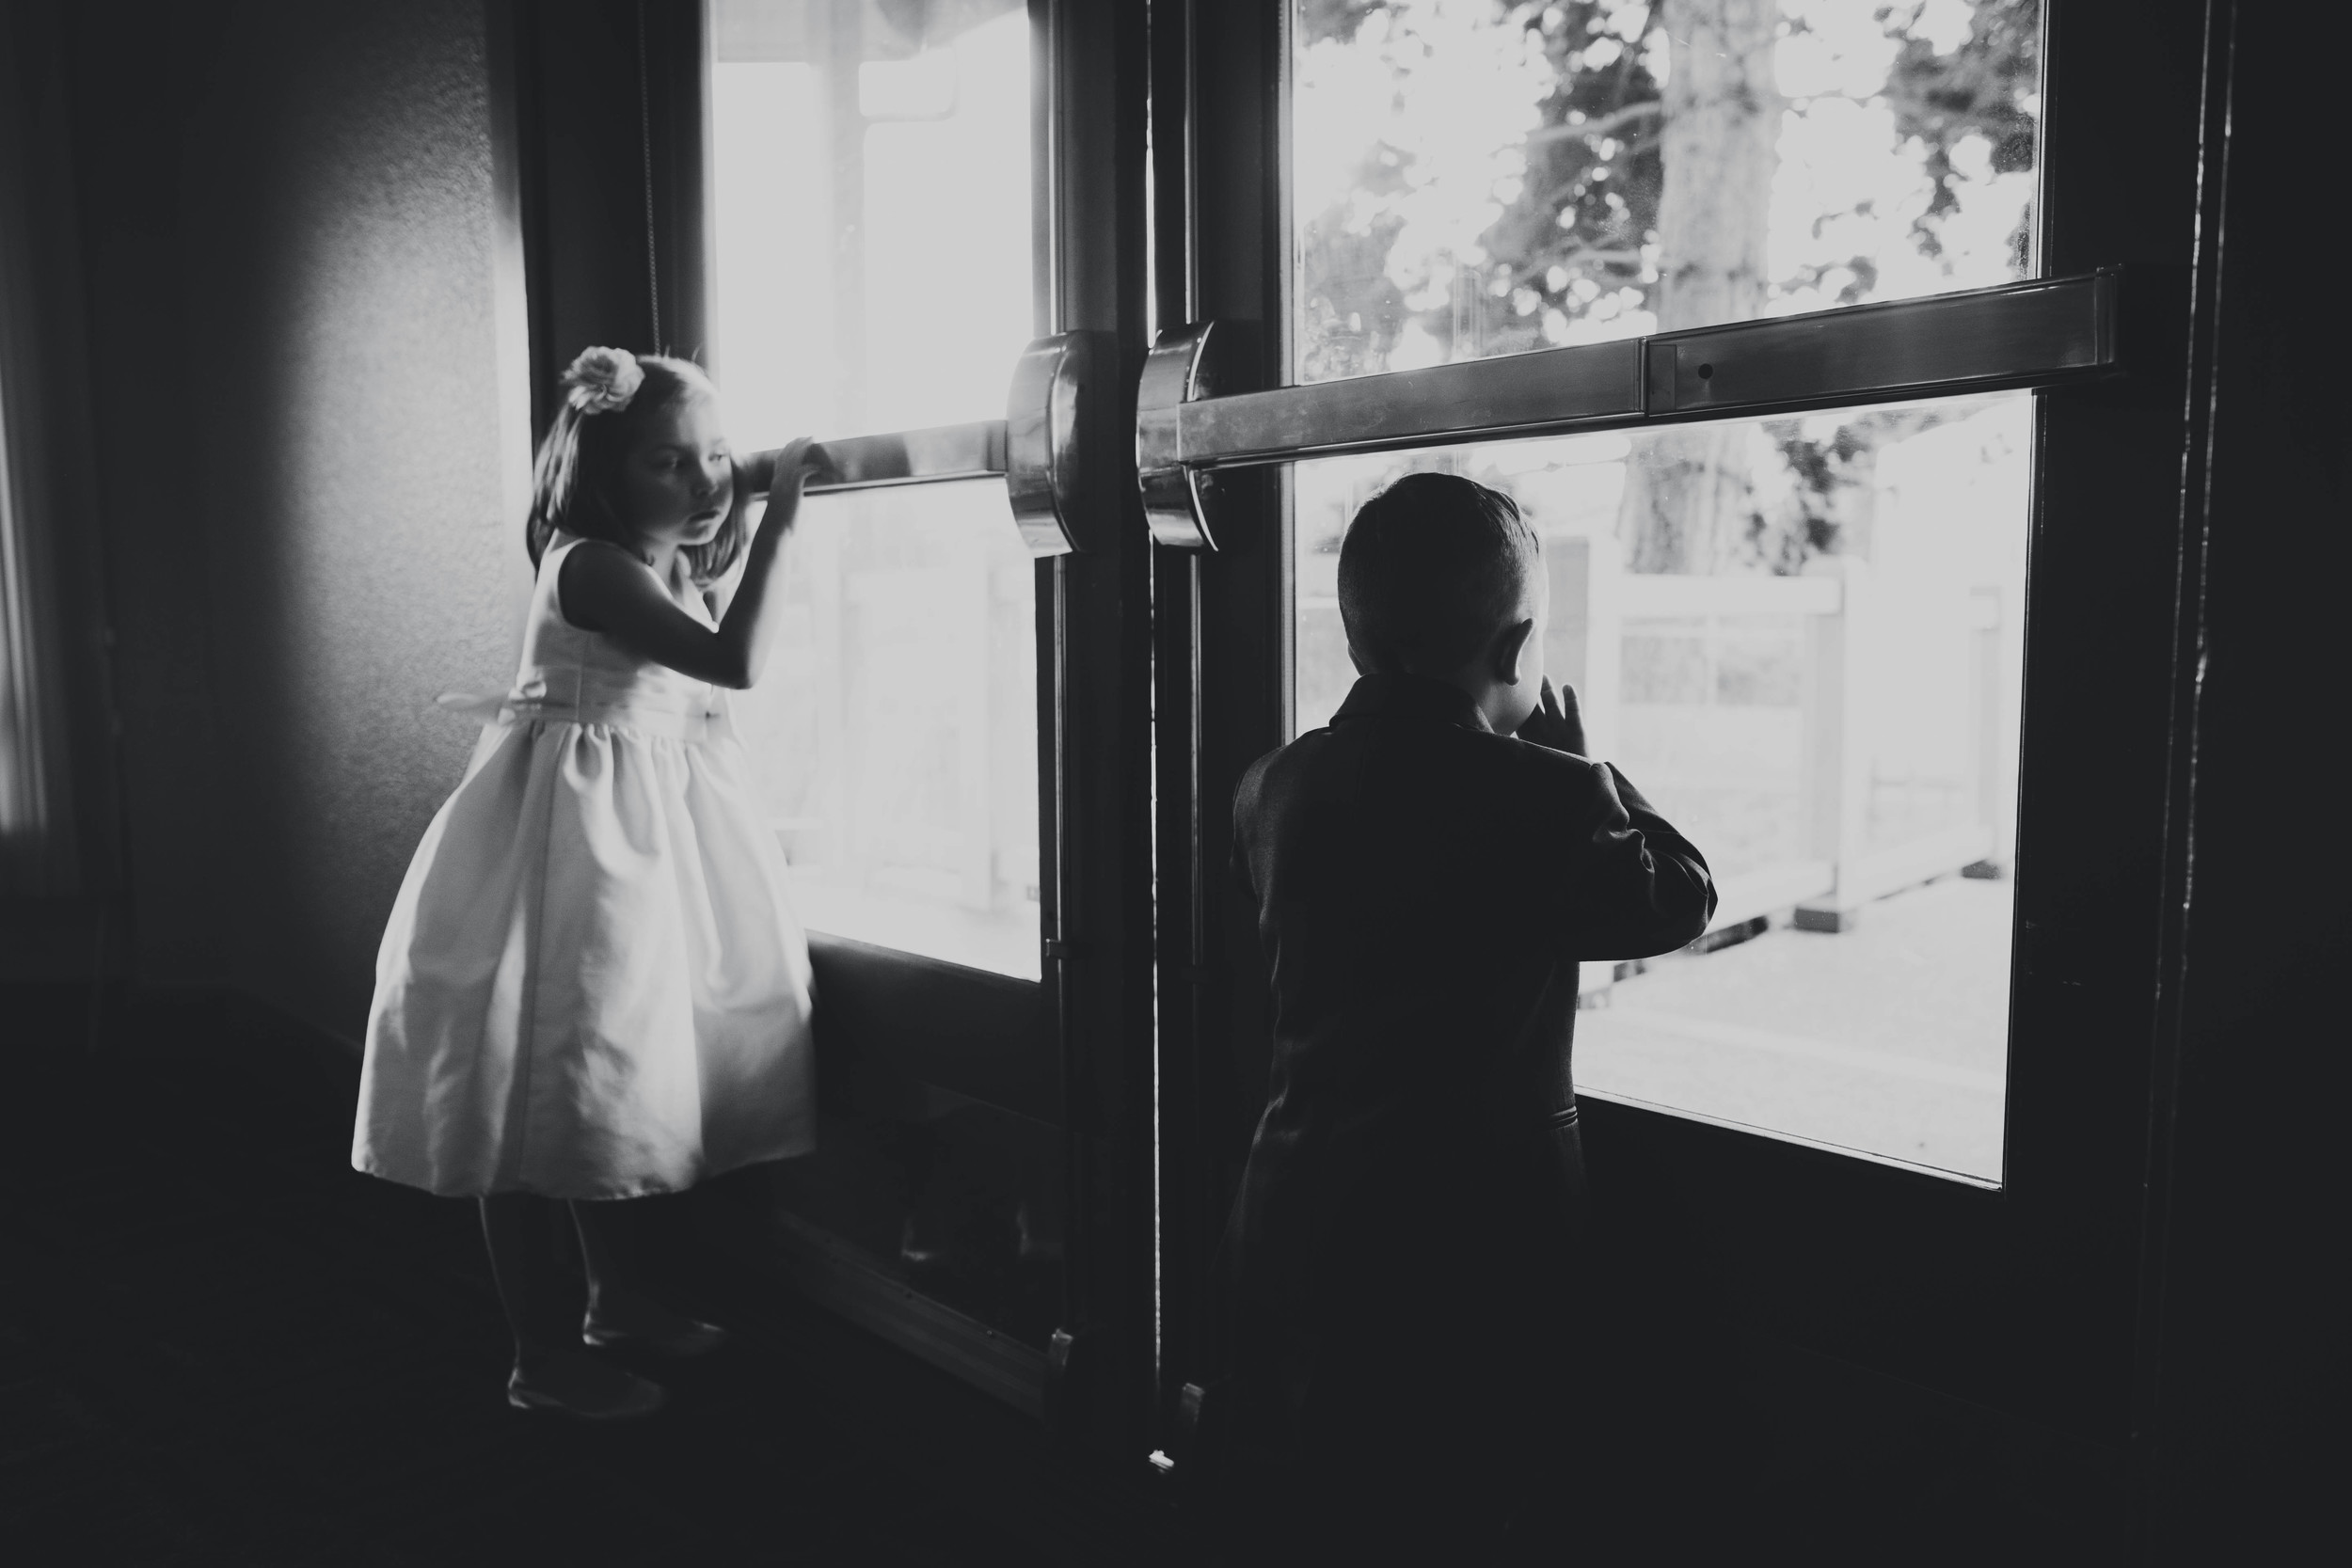 ashley_vos_seattle_wedding_photographer_0095aa.jpg